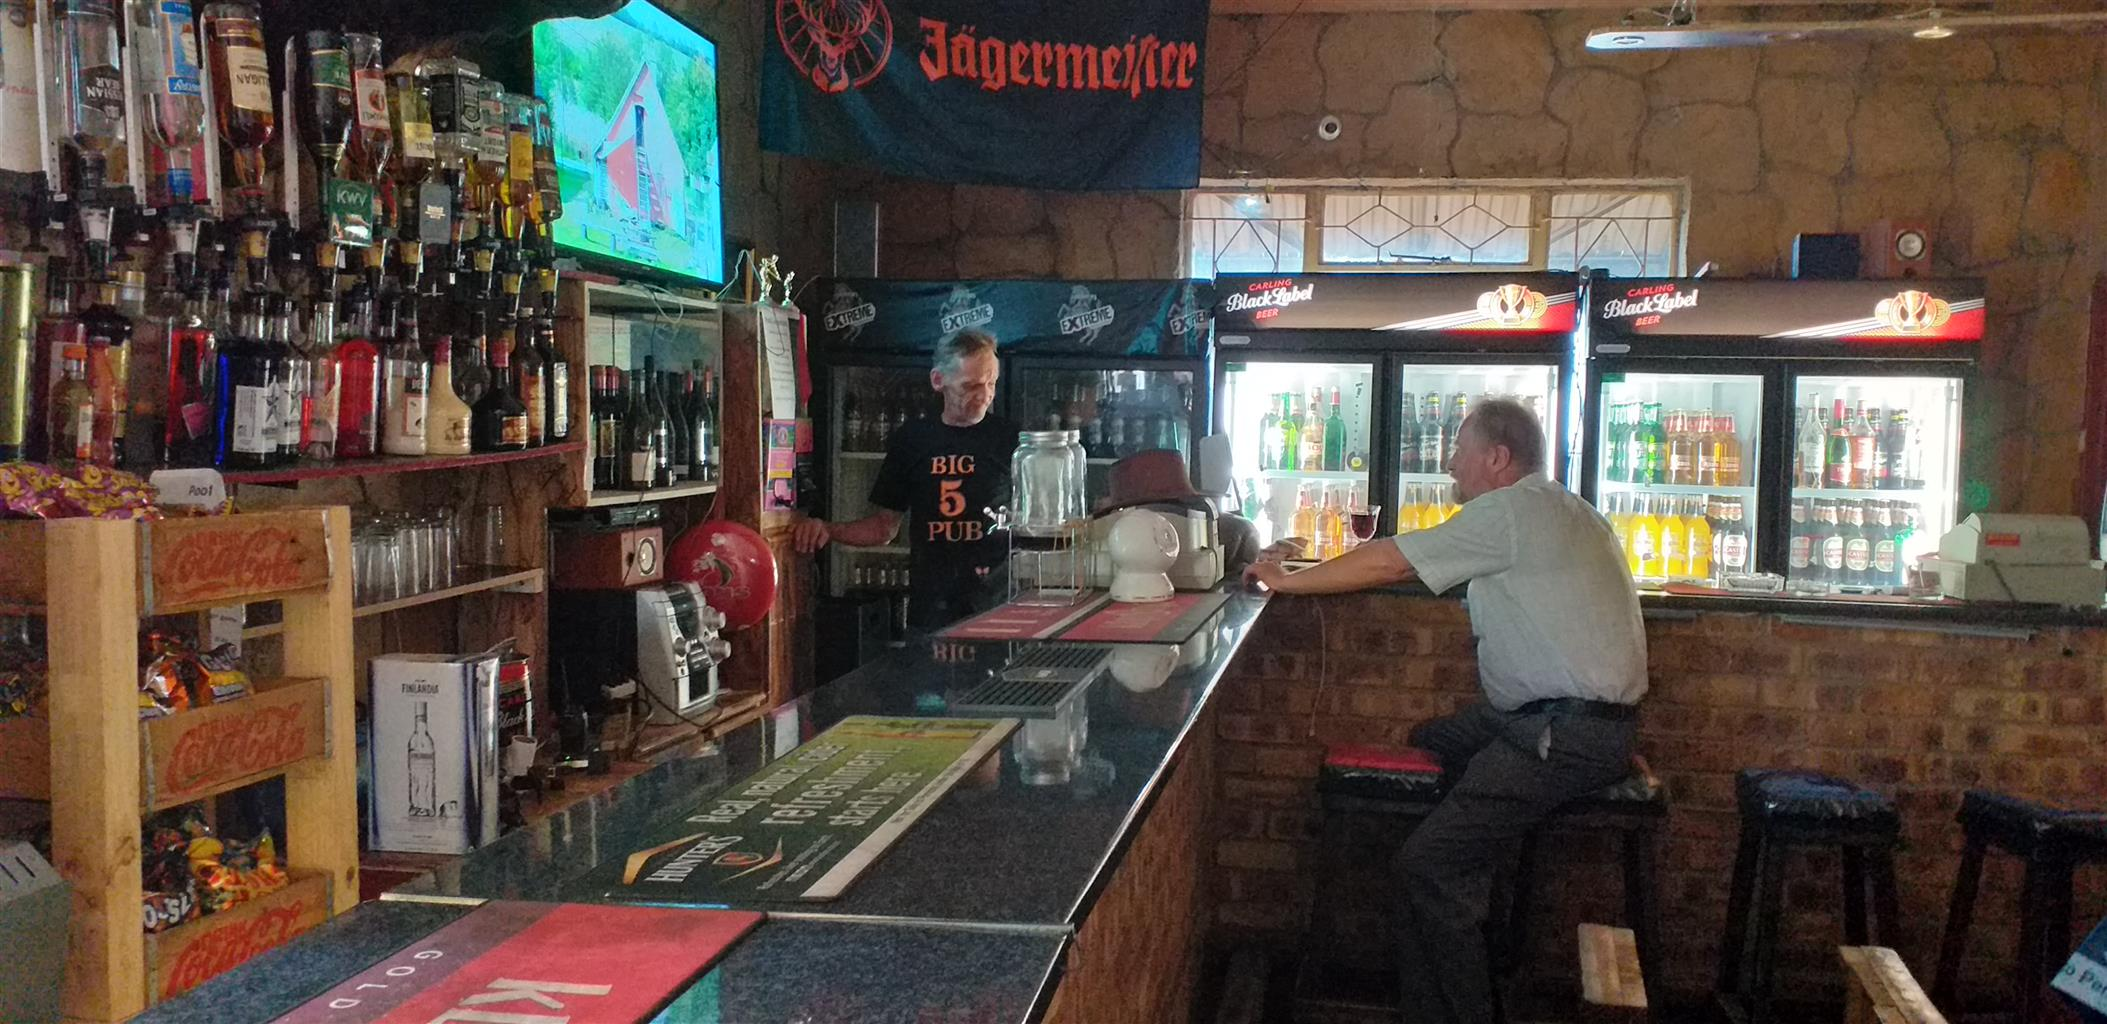 Germiston Residential  / Big 5 Pub. Rooms, Meals, Bar, Free WiFi